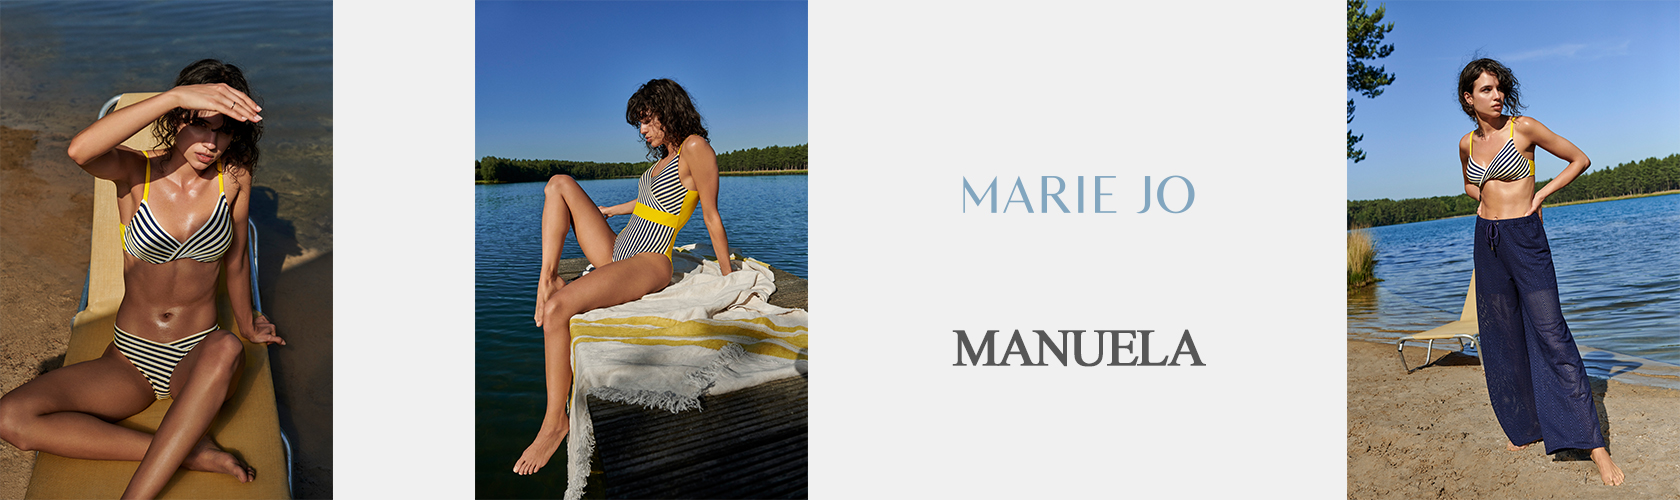 2020000928 Slideshow Manuela SUN 21.04.2021